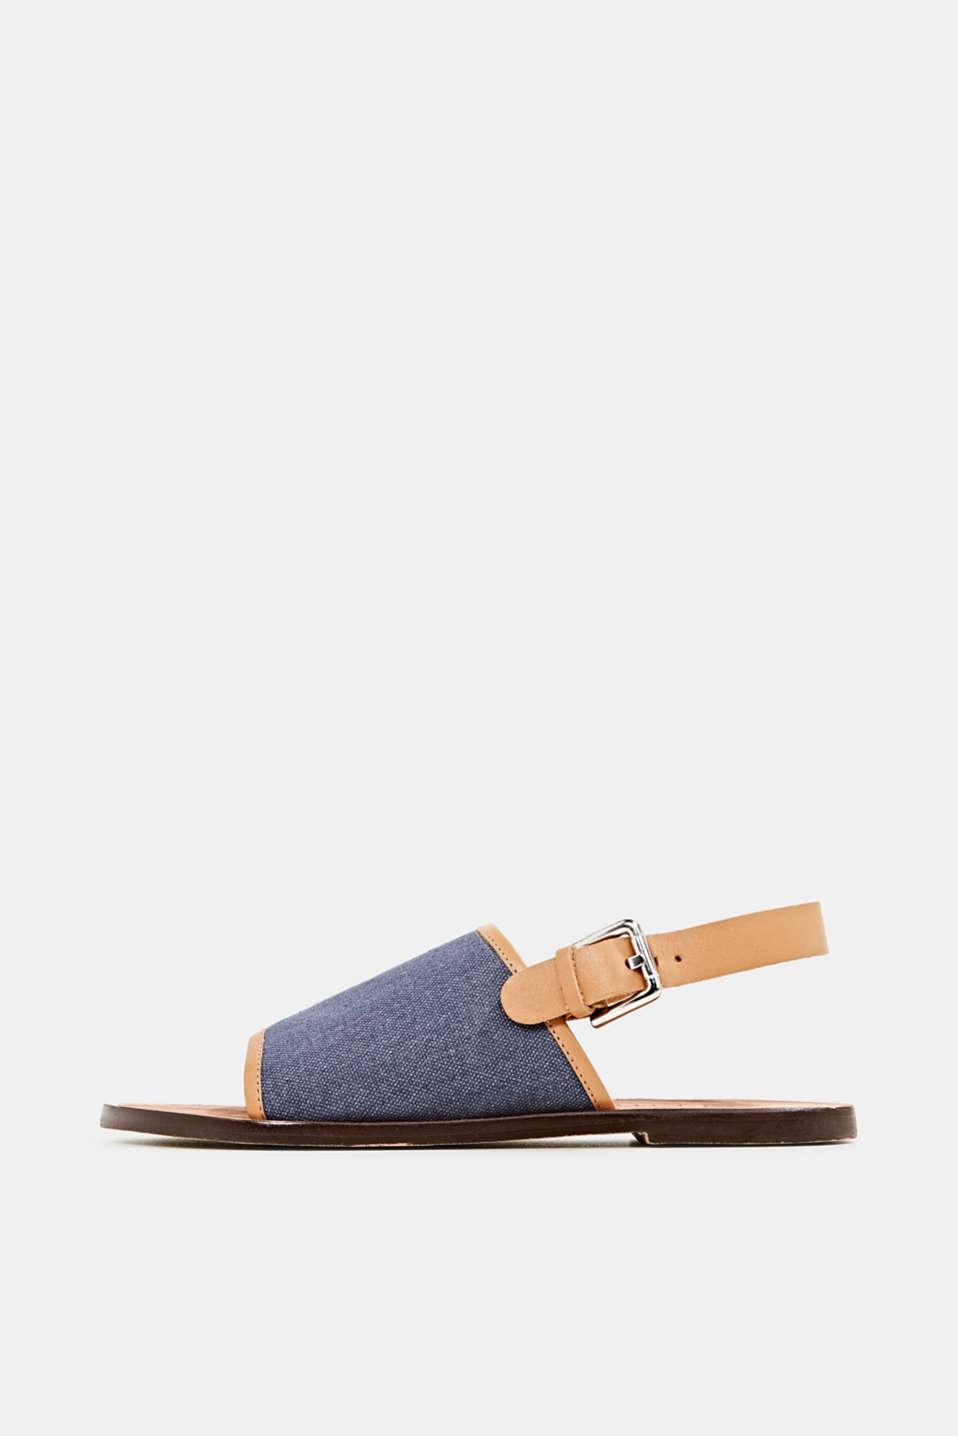 EarthColors® canvas sandals, LIGHT BLUE LAVENDER, detail image number 0